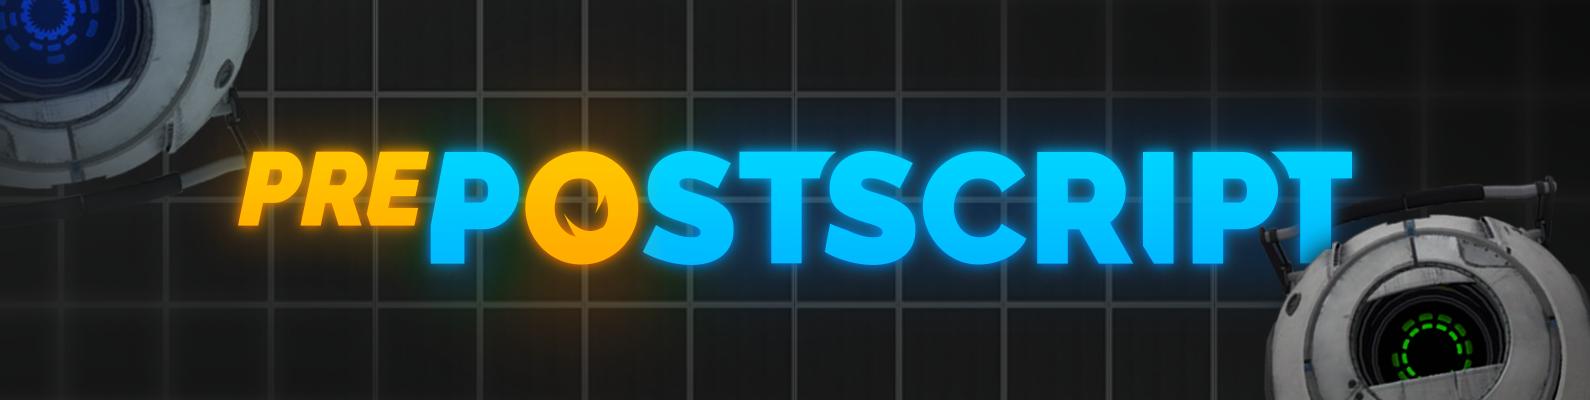 prePostscript poster